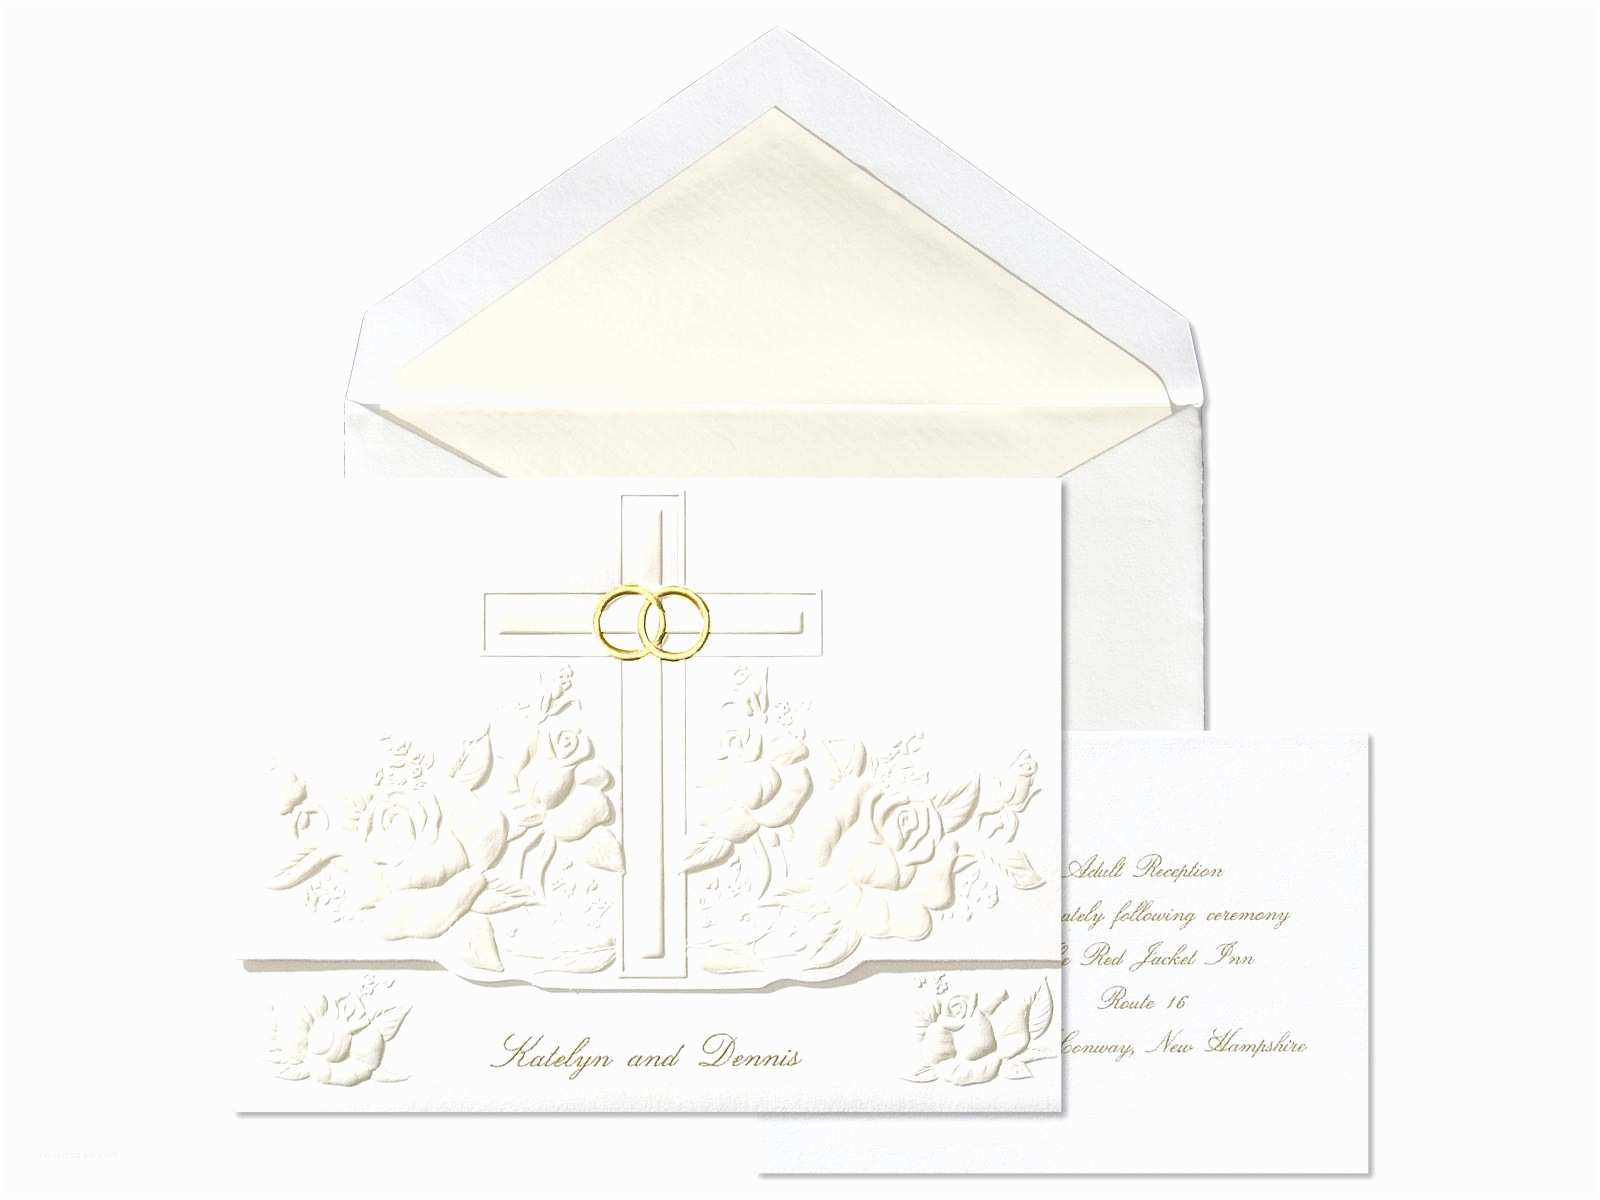 Religious Wedding Invitation Wording Wedding Invitation Wording Wedding Invitation Wording Non